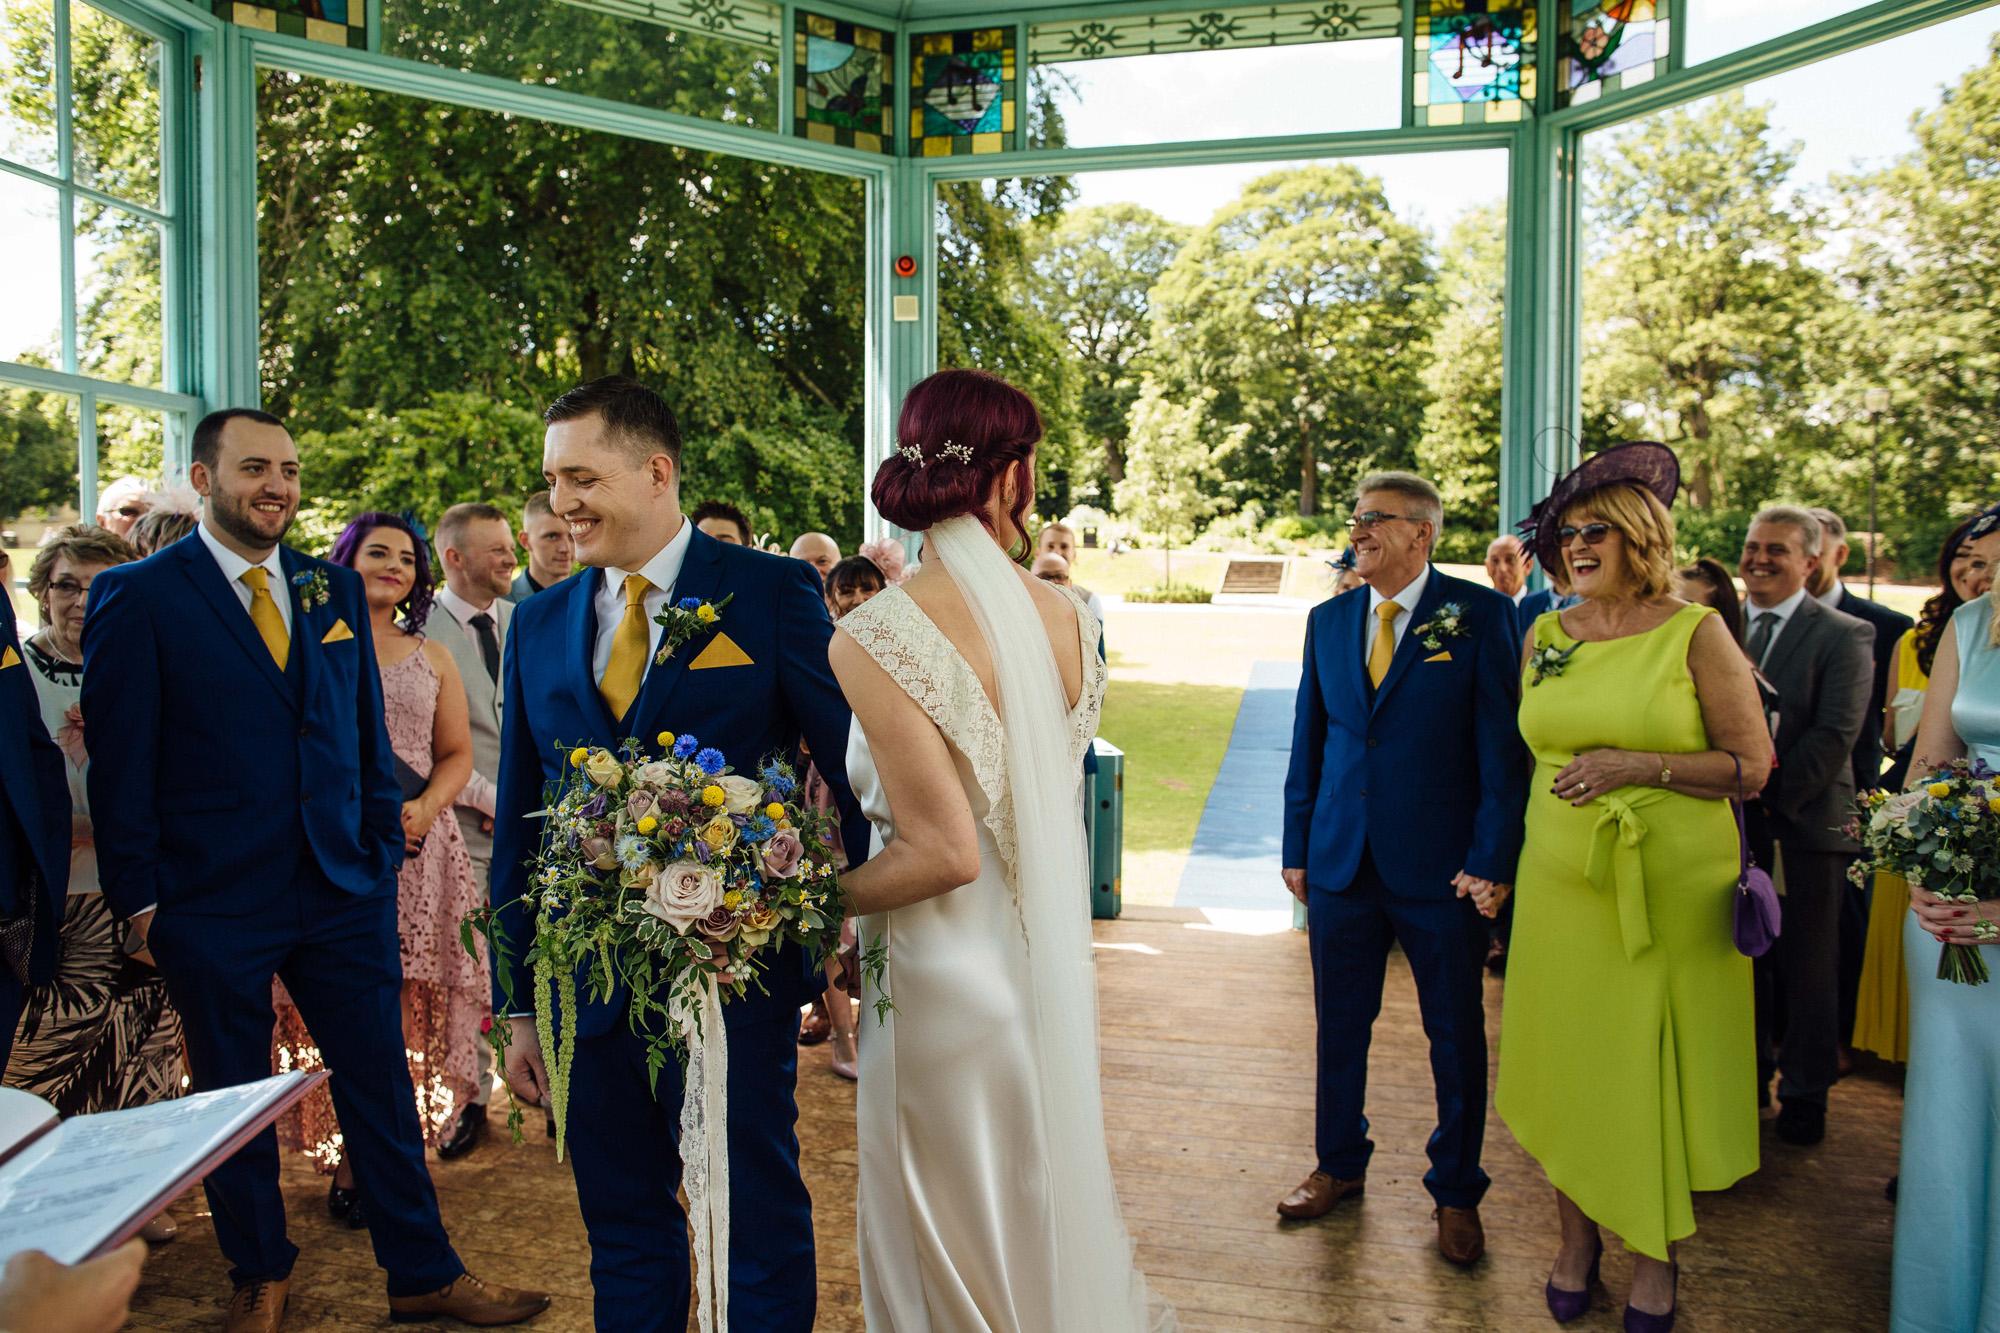 Sarah-Honeysuckle-Bias-Cut-Silk-Vintage-Inspired-Wedding-Gown-Sheffield-Wedding-Kate-Beaumont-13.jpg